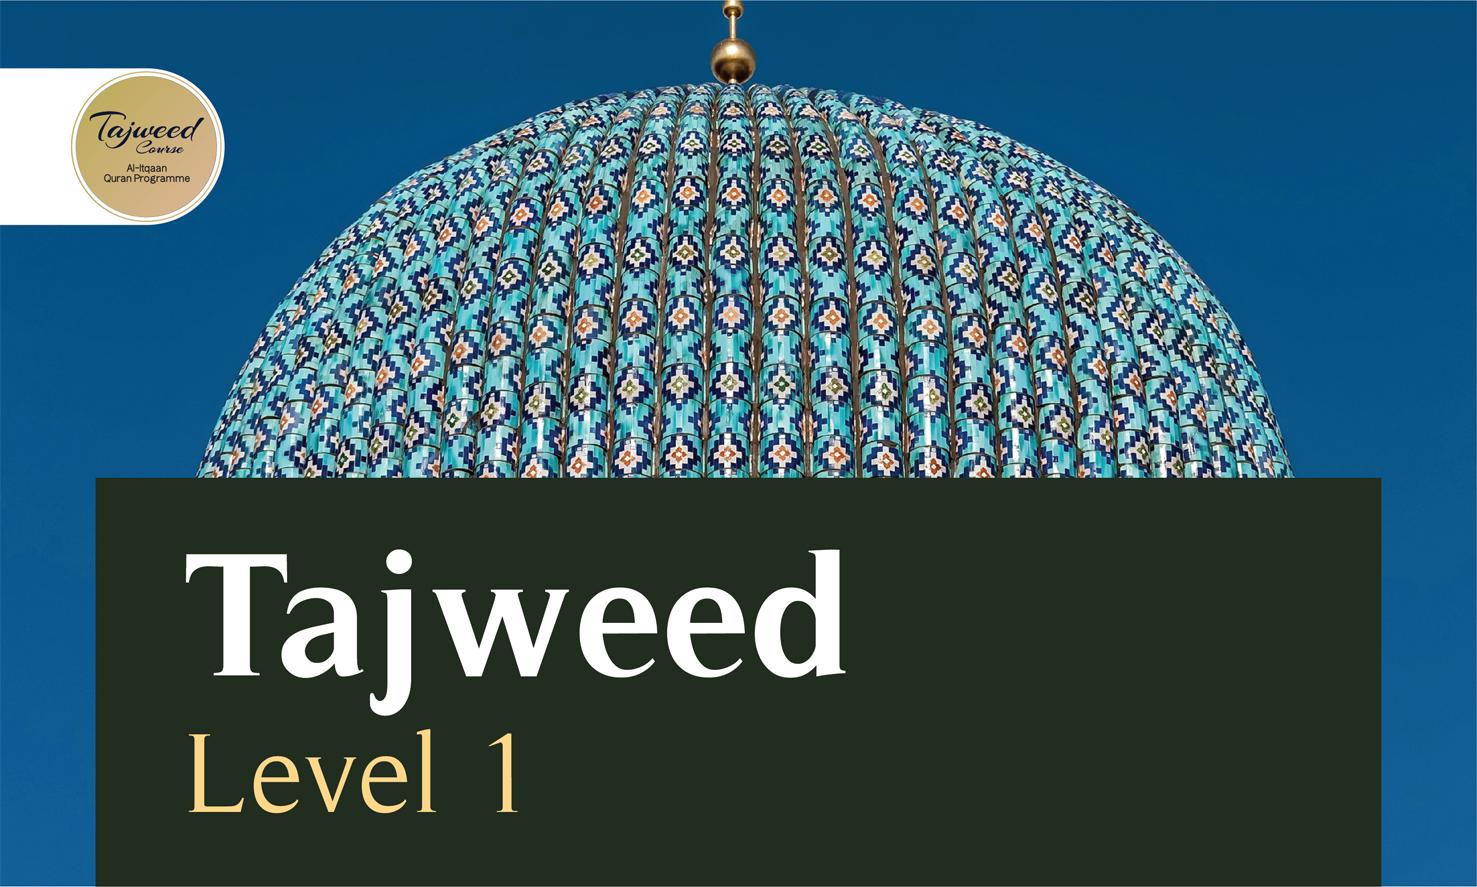 Al-Itqaan-Slideshow_PROOF-3-02 EDITED